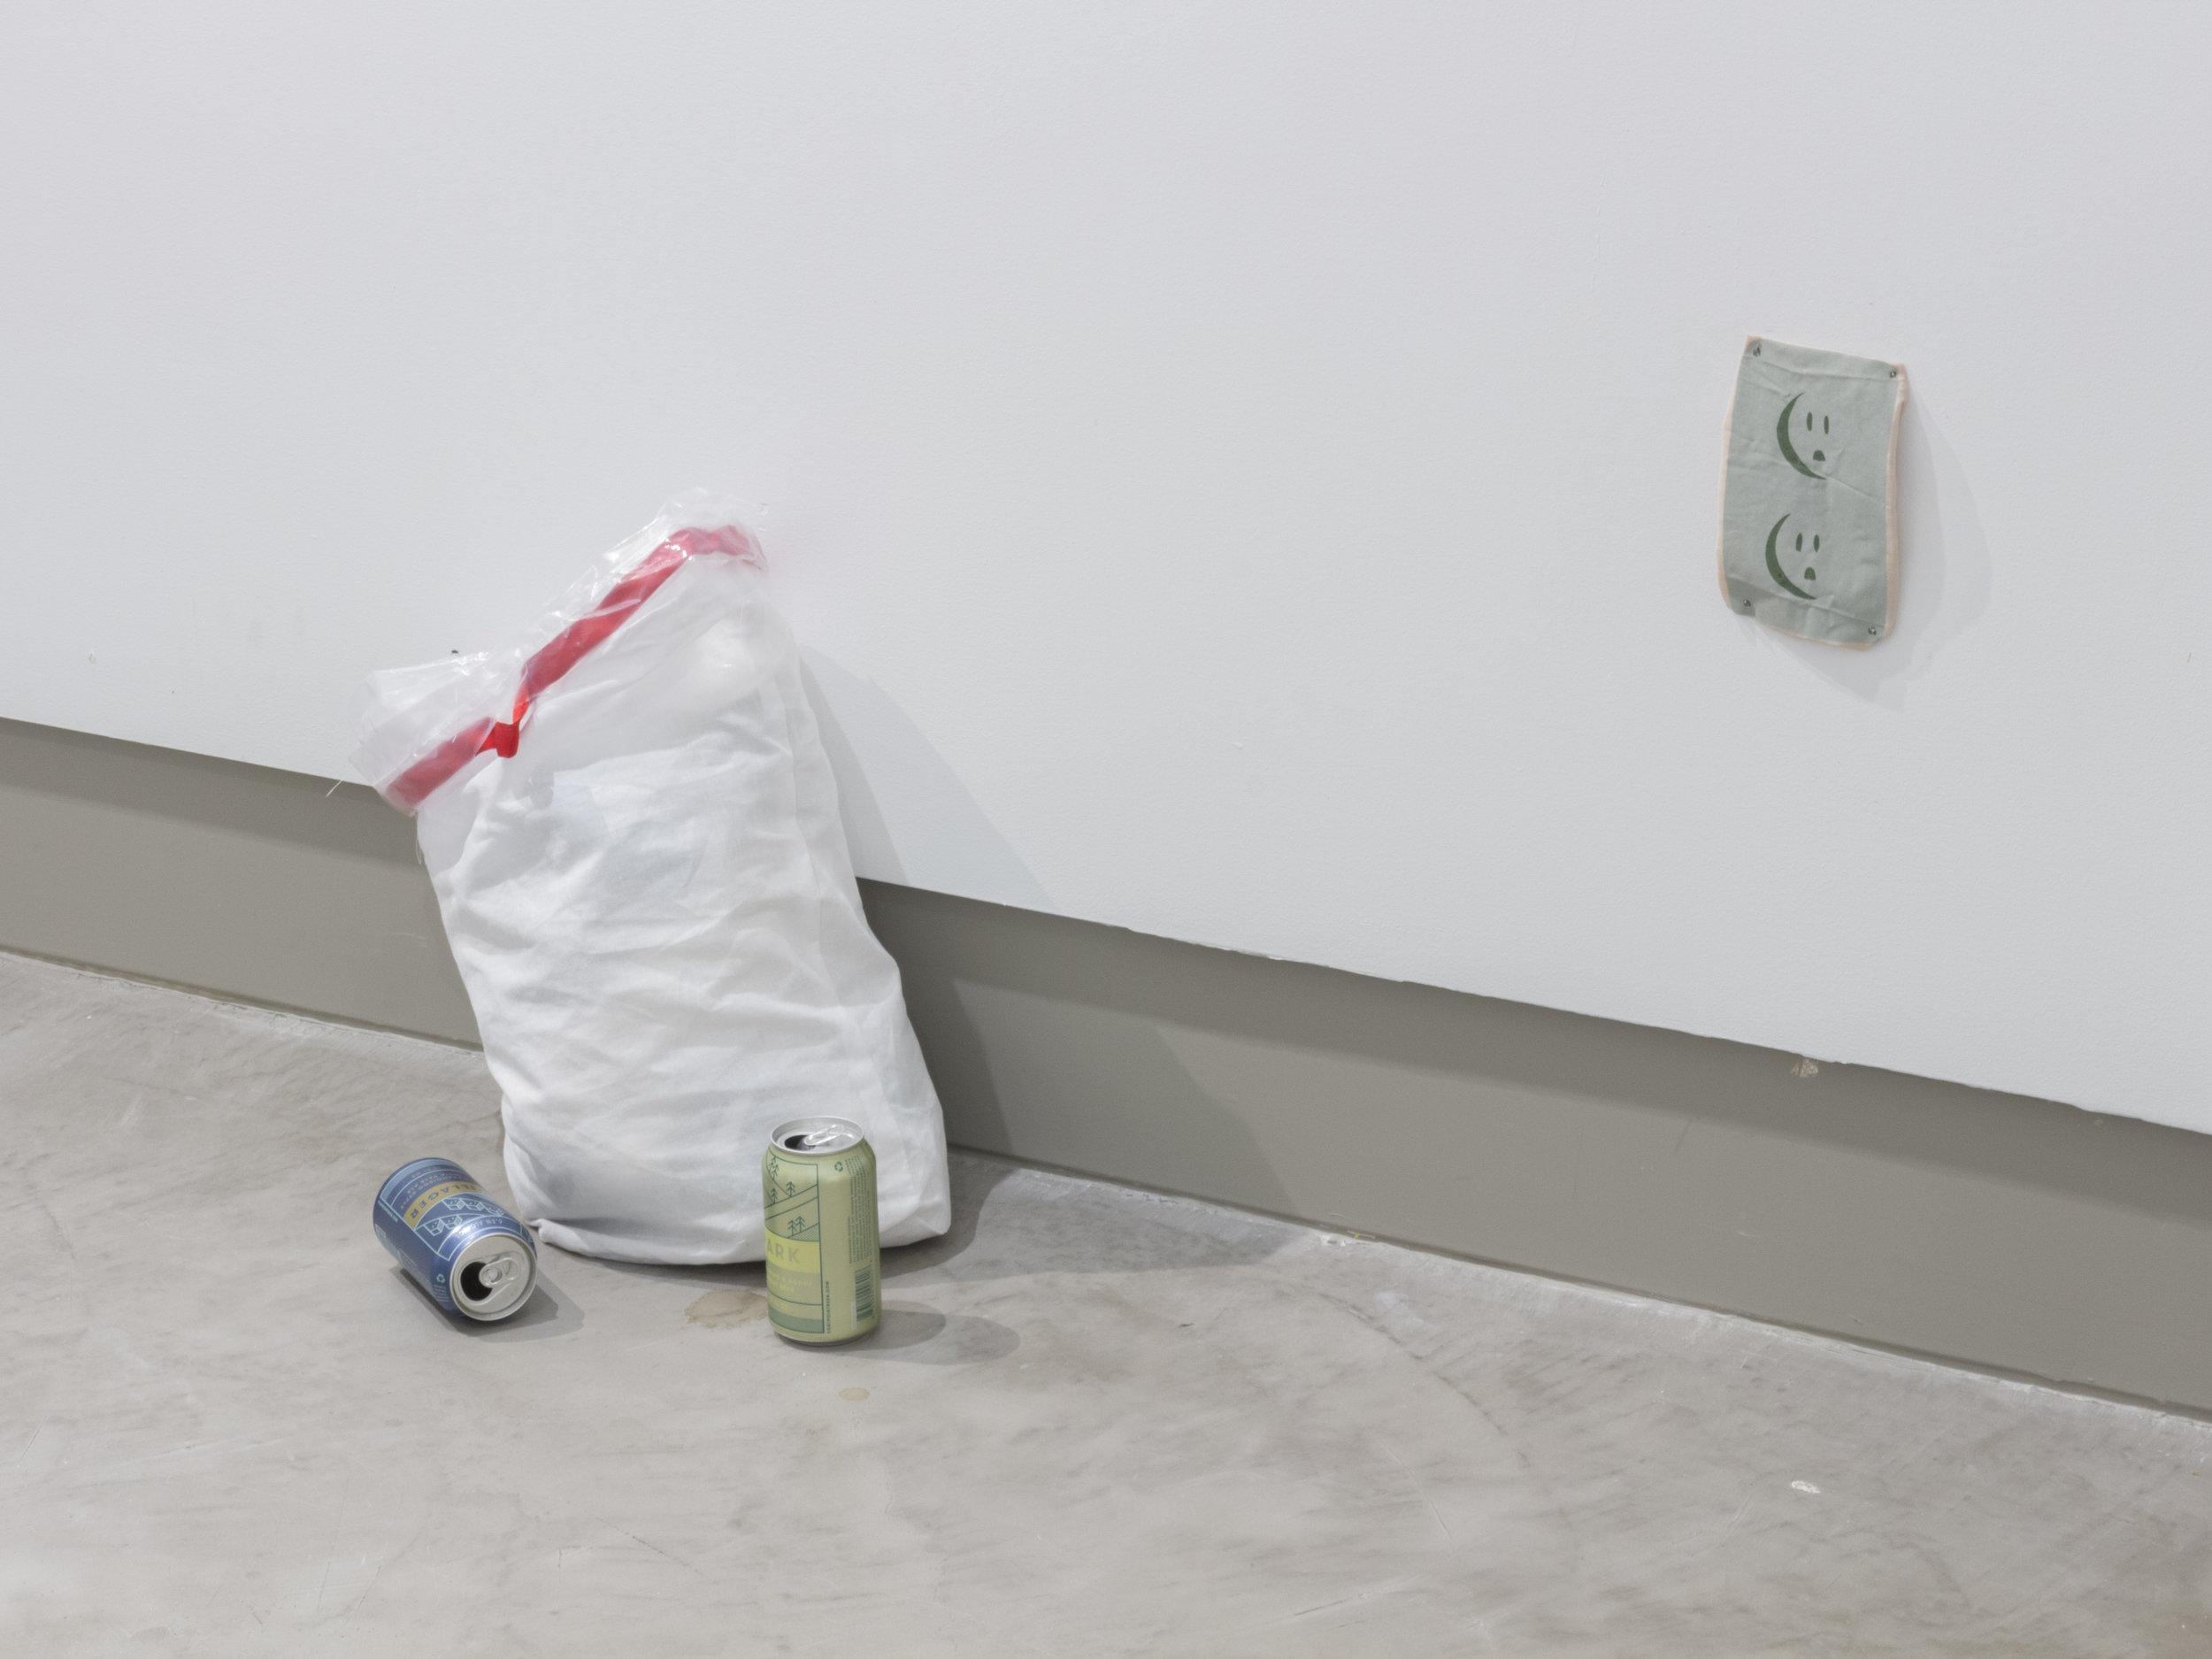 """Hangover"" (2016), Fabric, ribbon, plastic, studio detritus, exhibition opening garbage, Dimensions Variable"